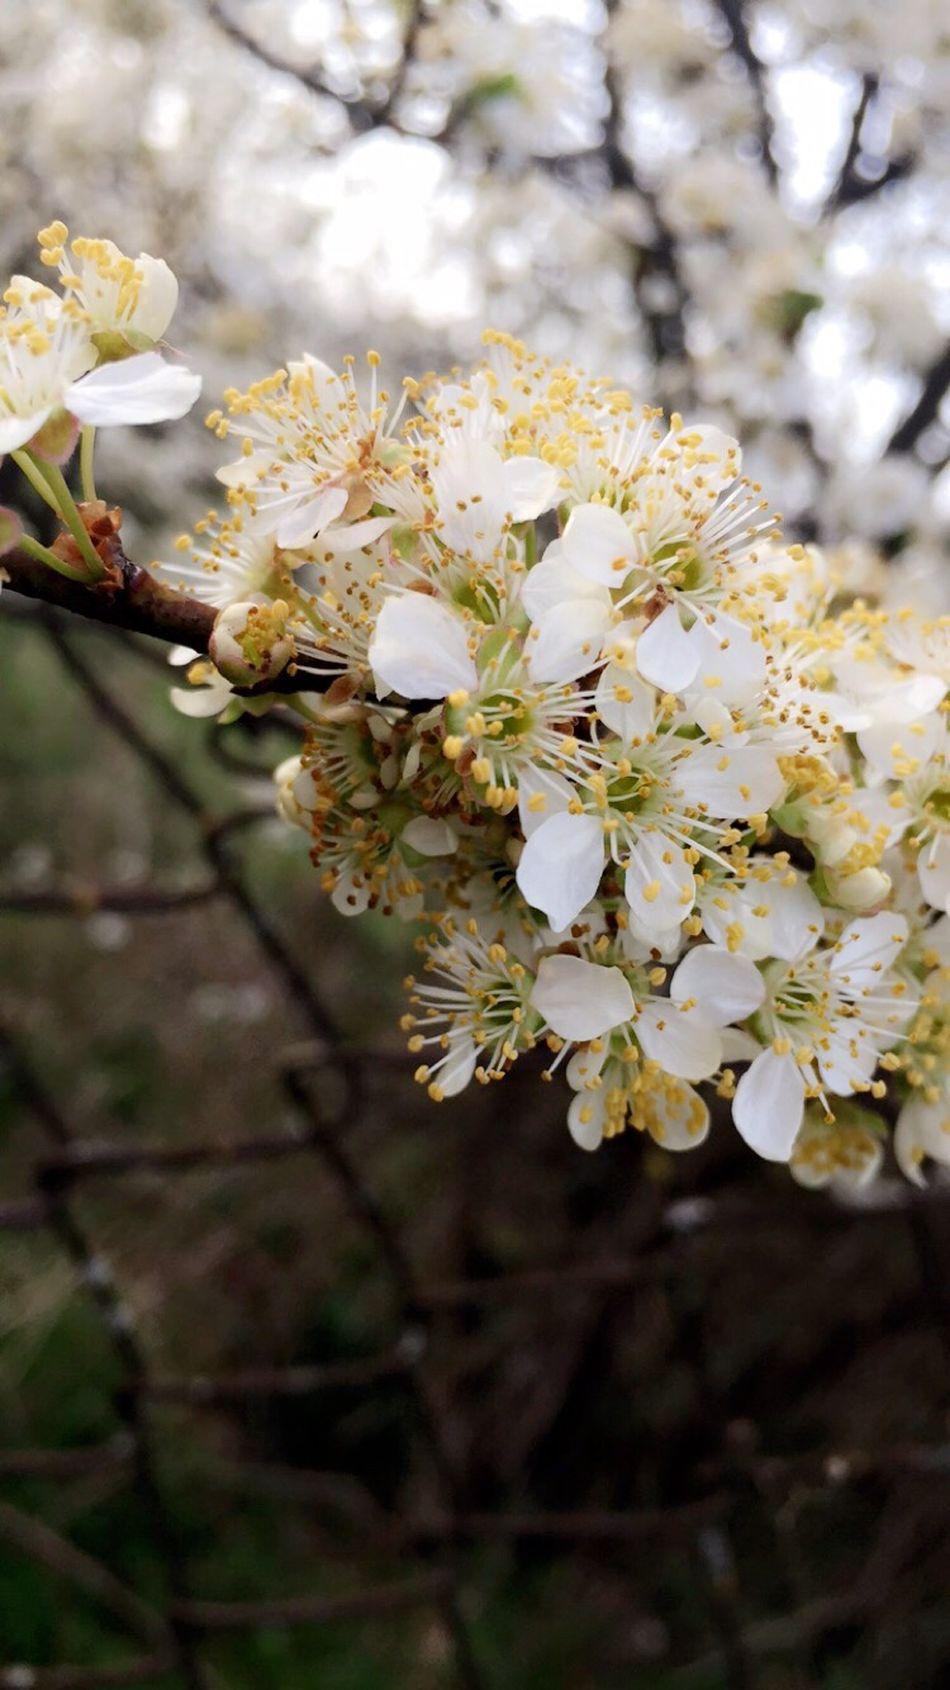 Adinafrasinphotography Spring Nature Photography Outdoors OpenEdit Sunflowers Spring Flowers Flowers